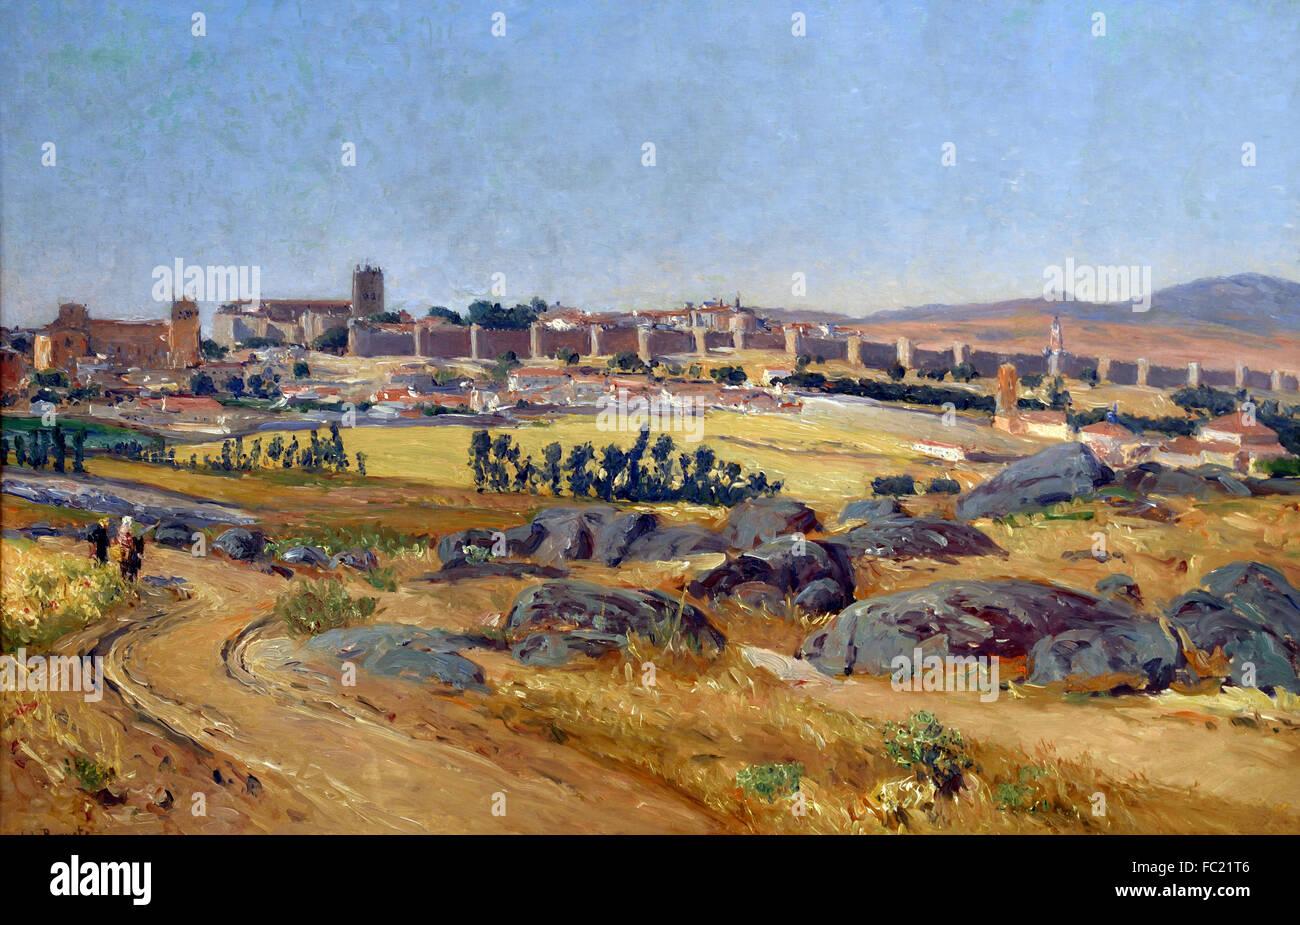 Ávila 1909 Aureliano Beruete y Moret 1845 - 1912 Spanish Spain - Stock Image